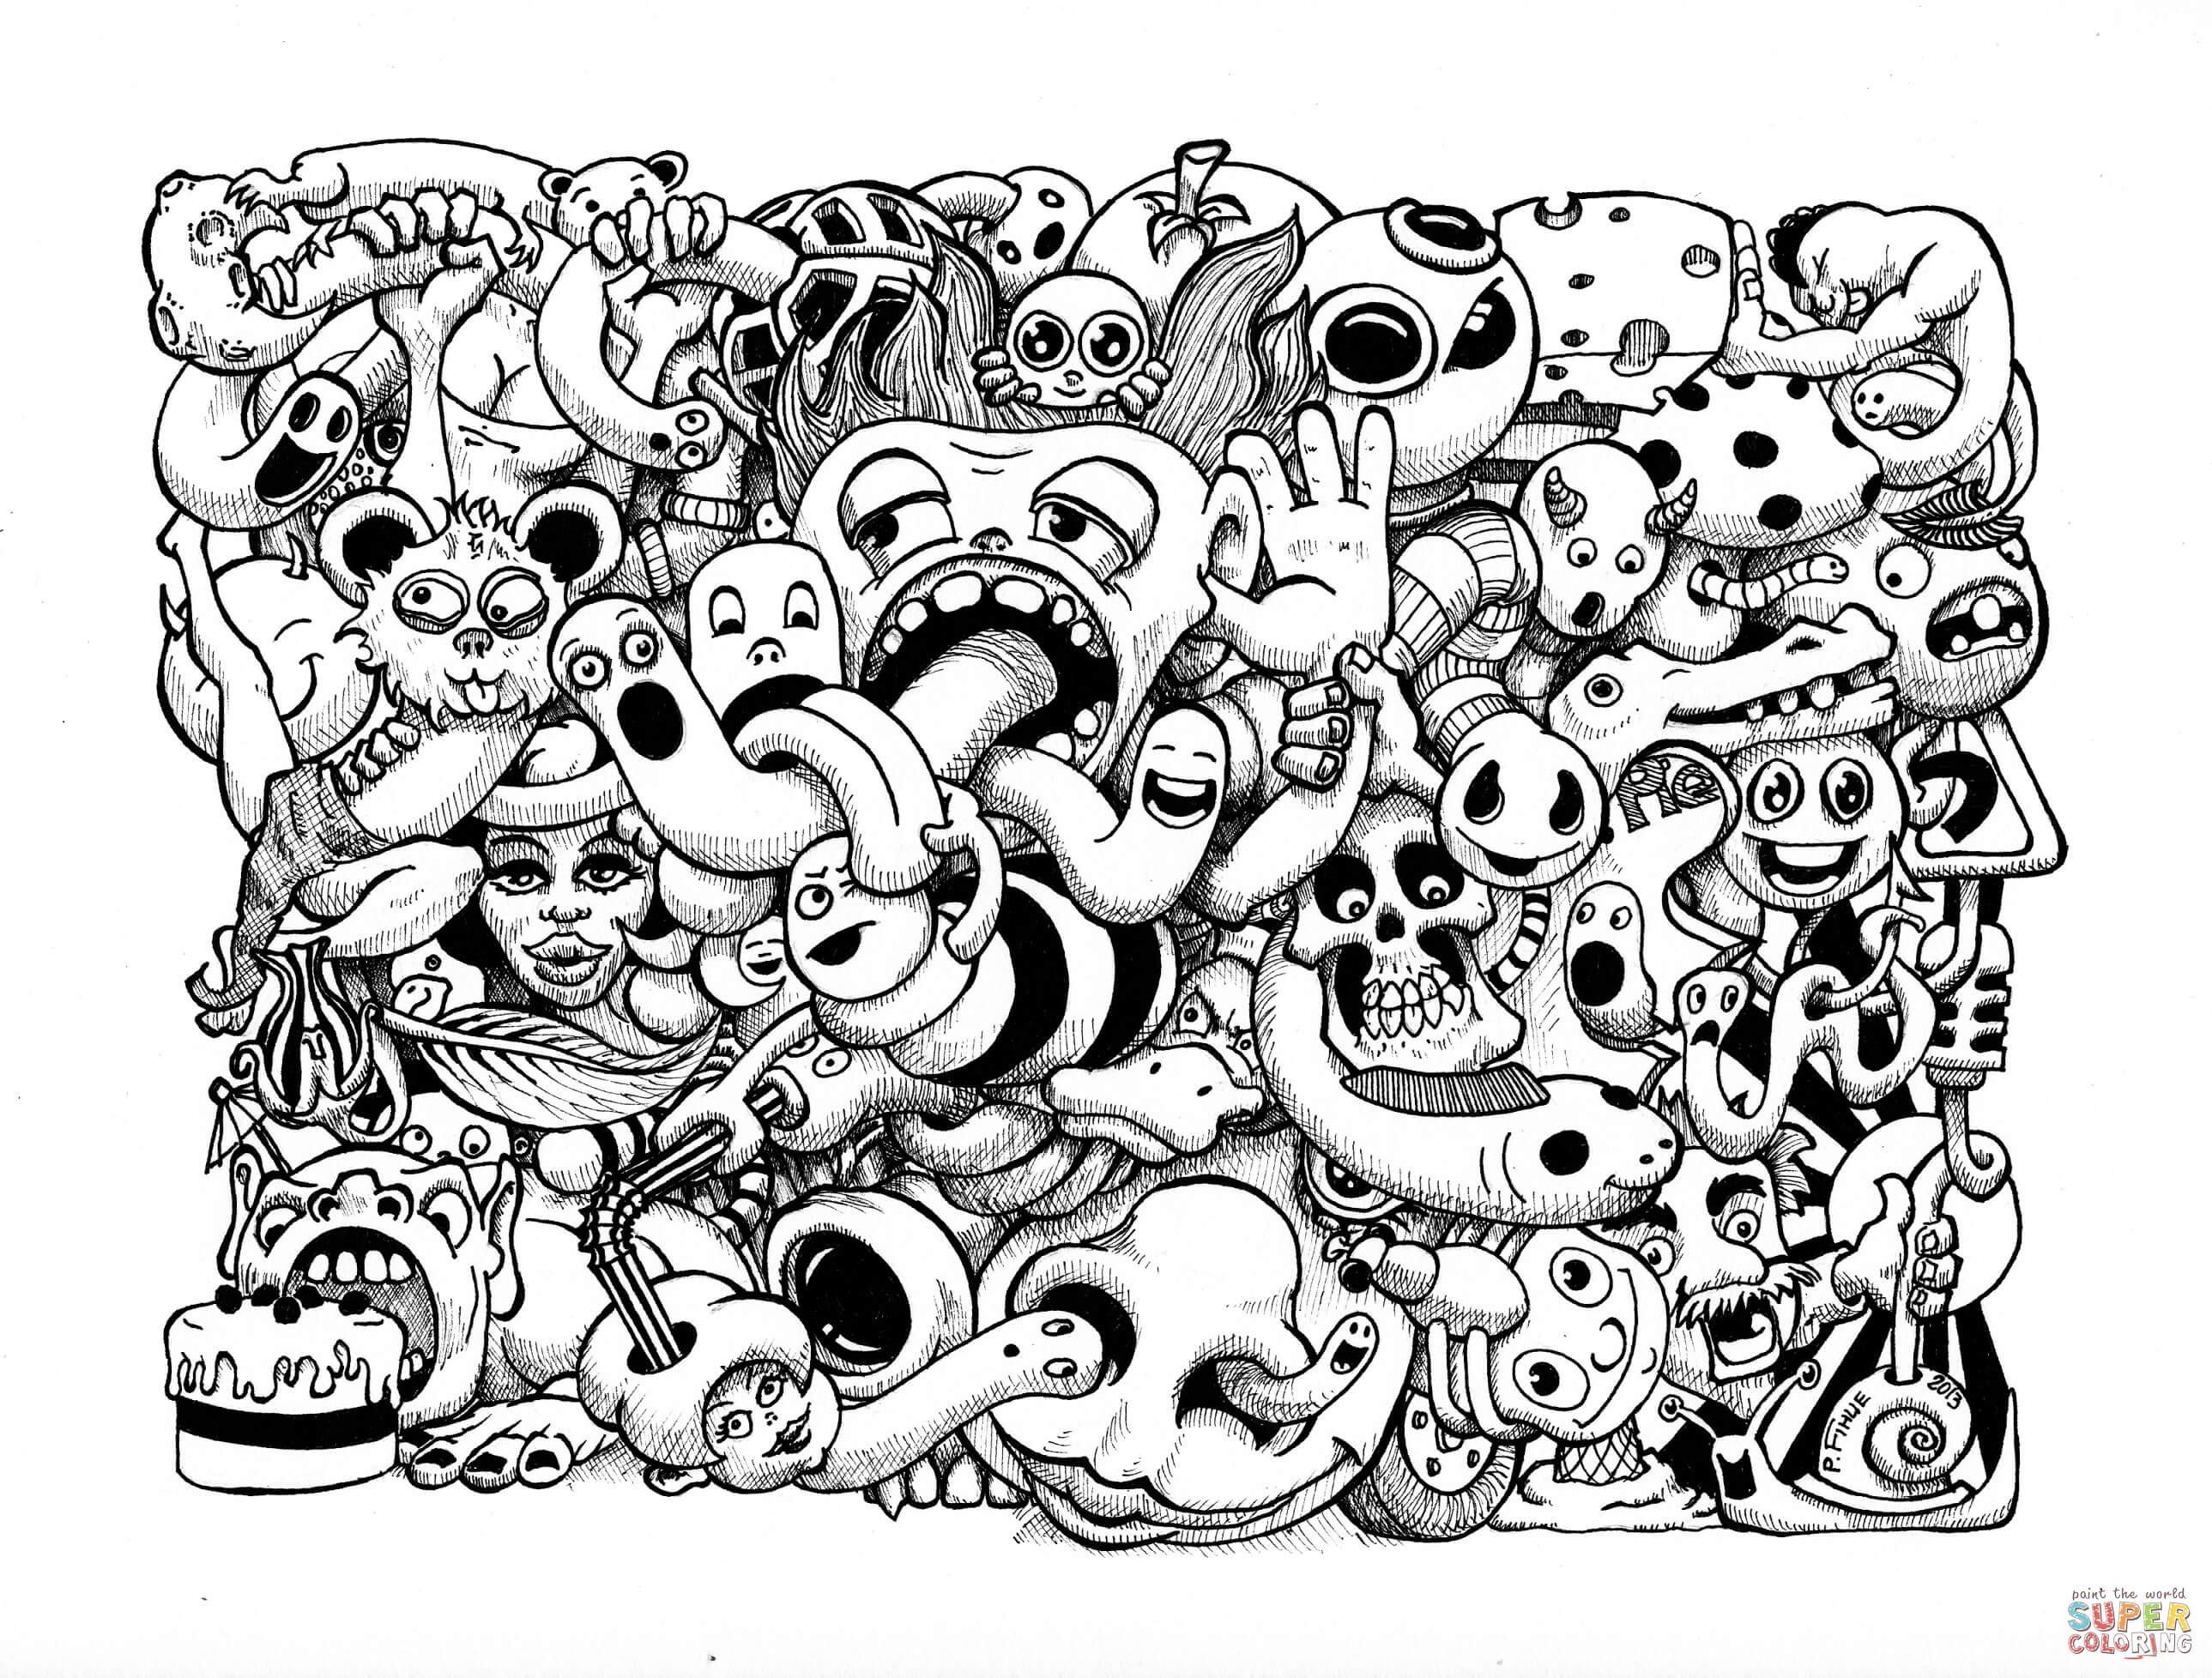 Doodle Art Coloring Pages  Doodle Art by Pierre Fihue coloring page